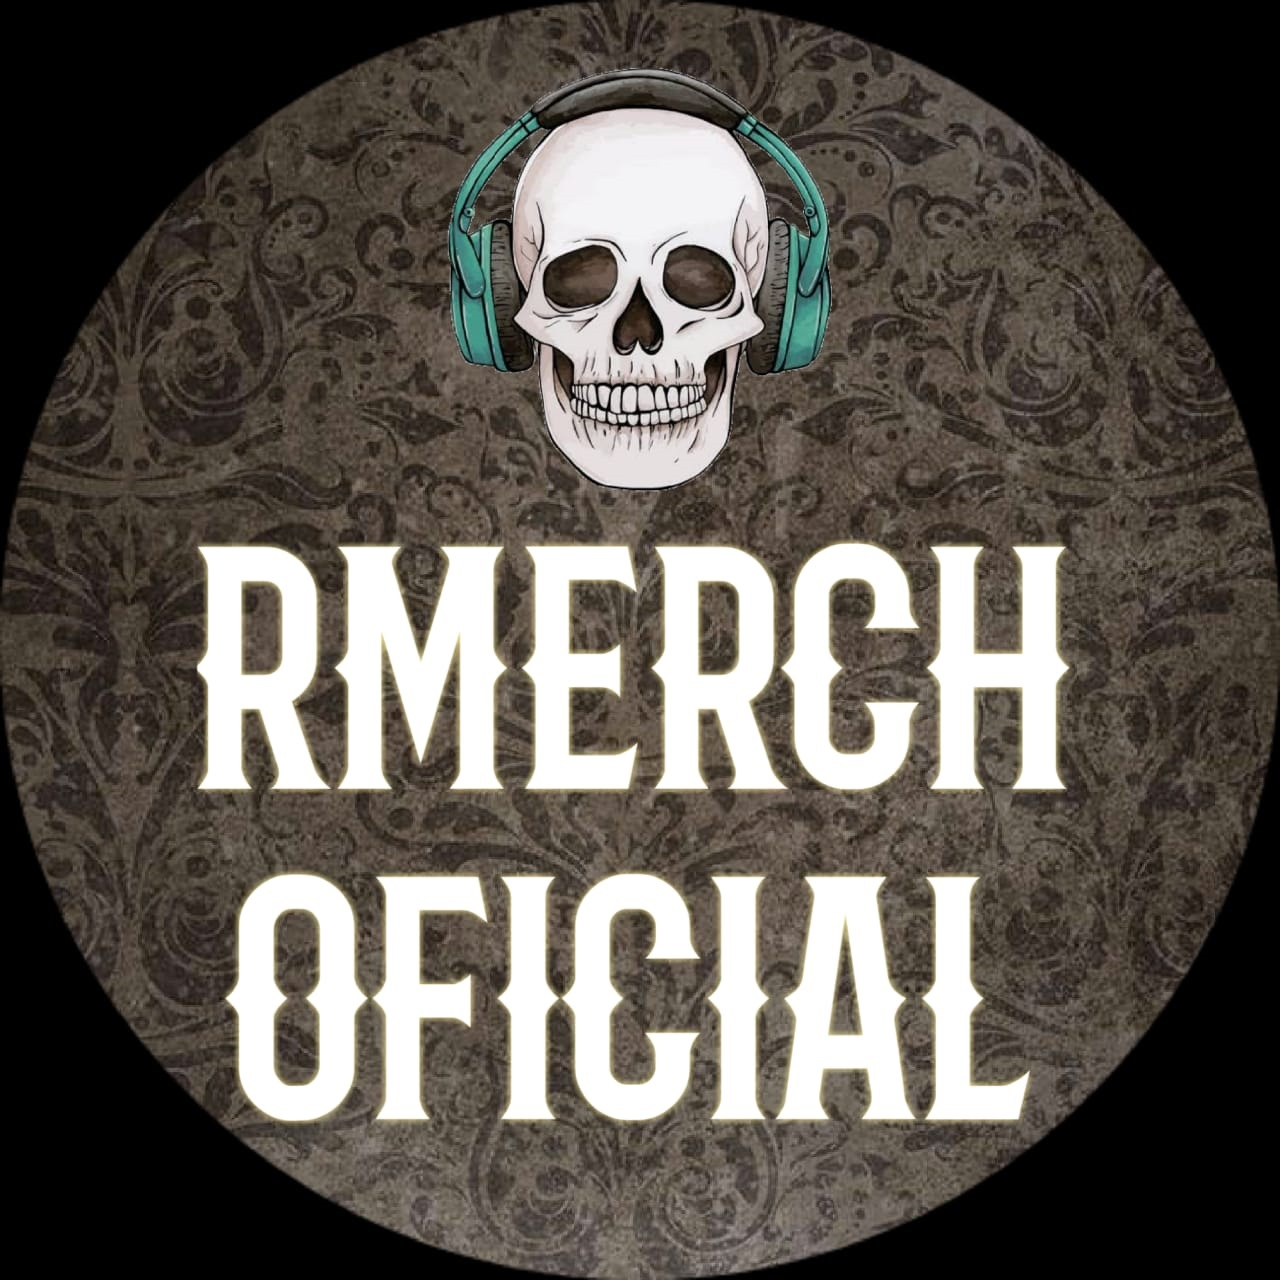 RMerch - Apoiador Cultural